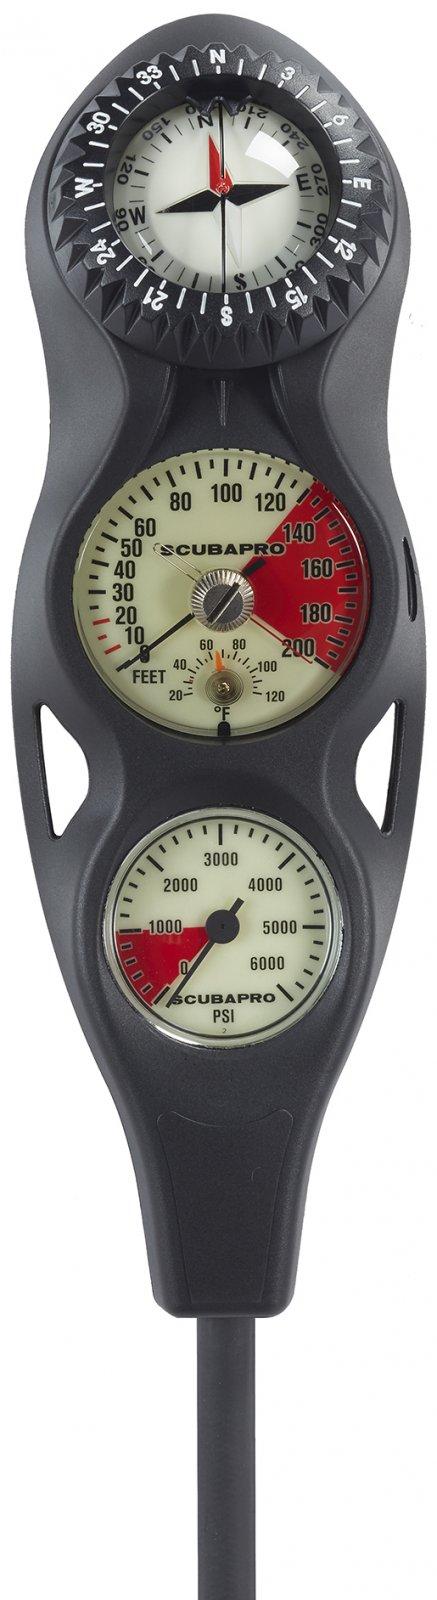 SCUBAPRO 3 Gauge In-Line Console w/FS-1.5 Compass